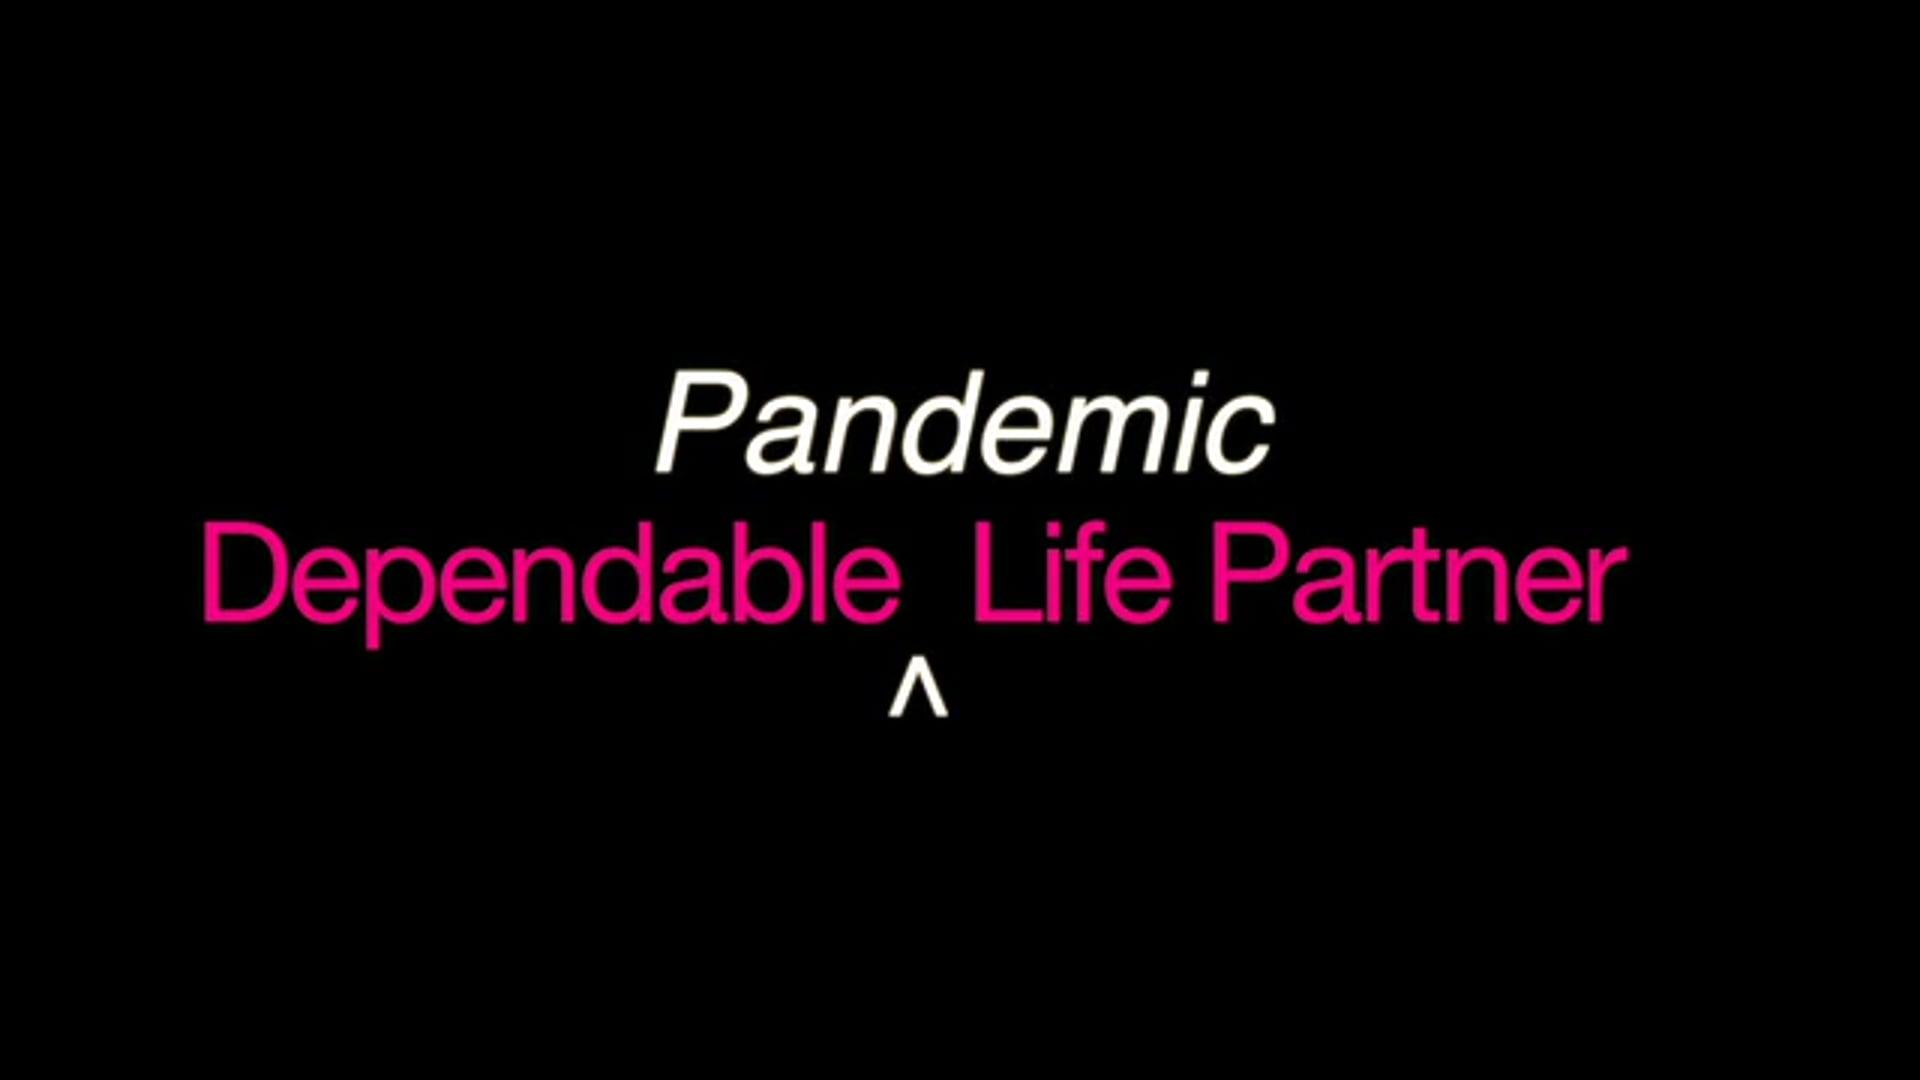 Dependable Pandemic Life Partner